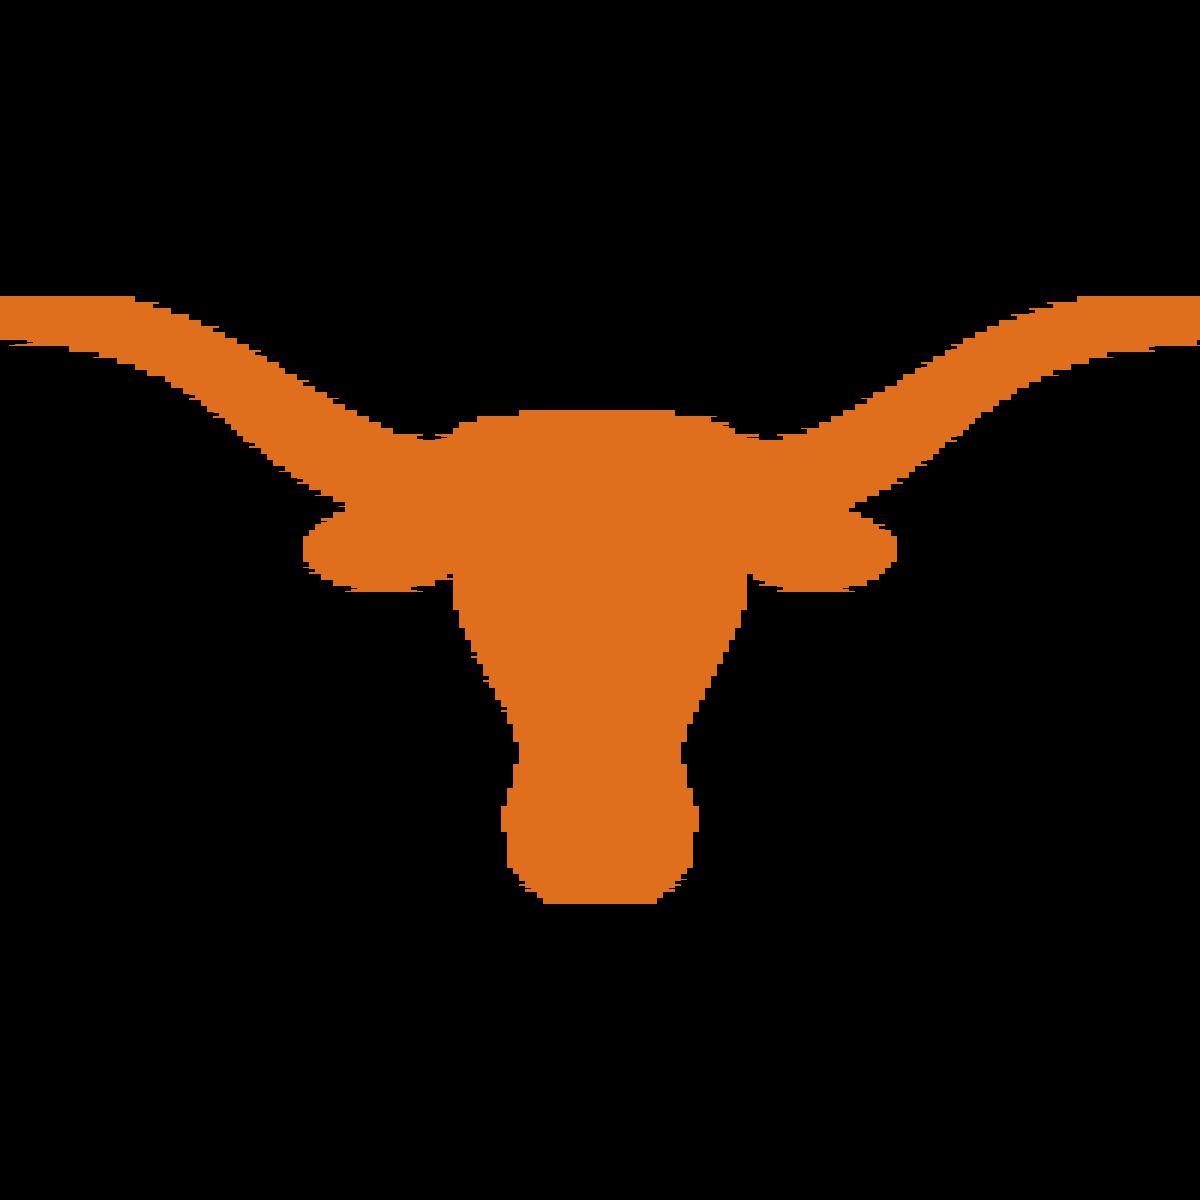 College Football Top 25 Rankings: Texas